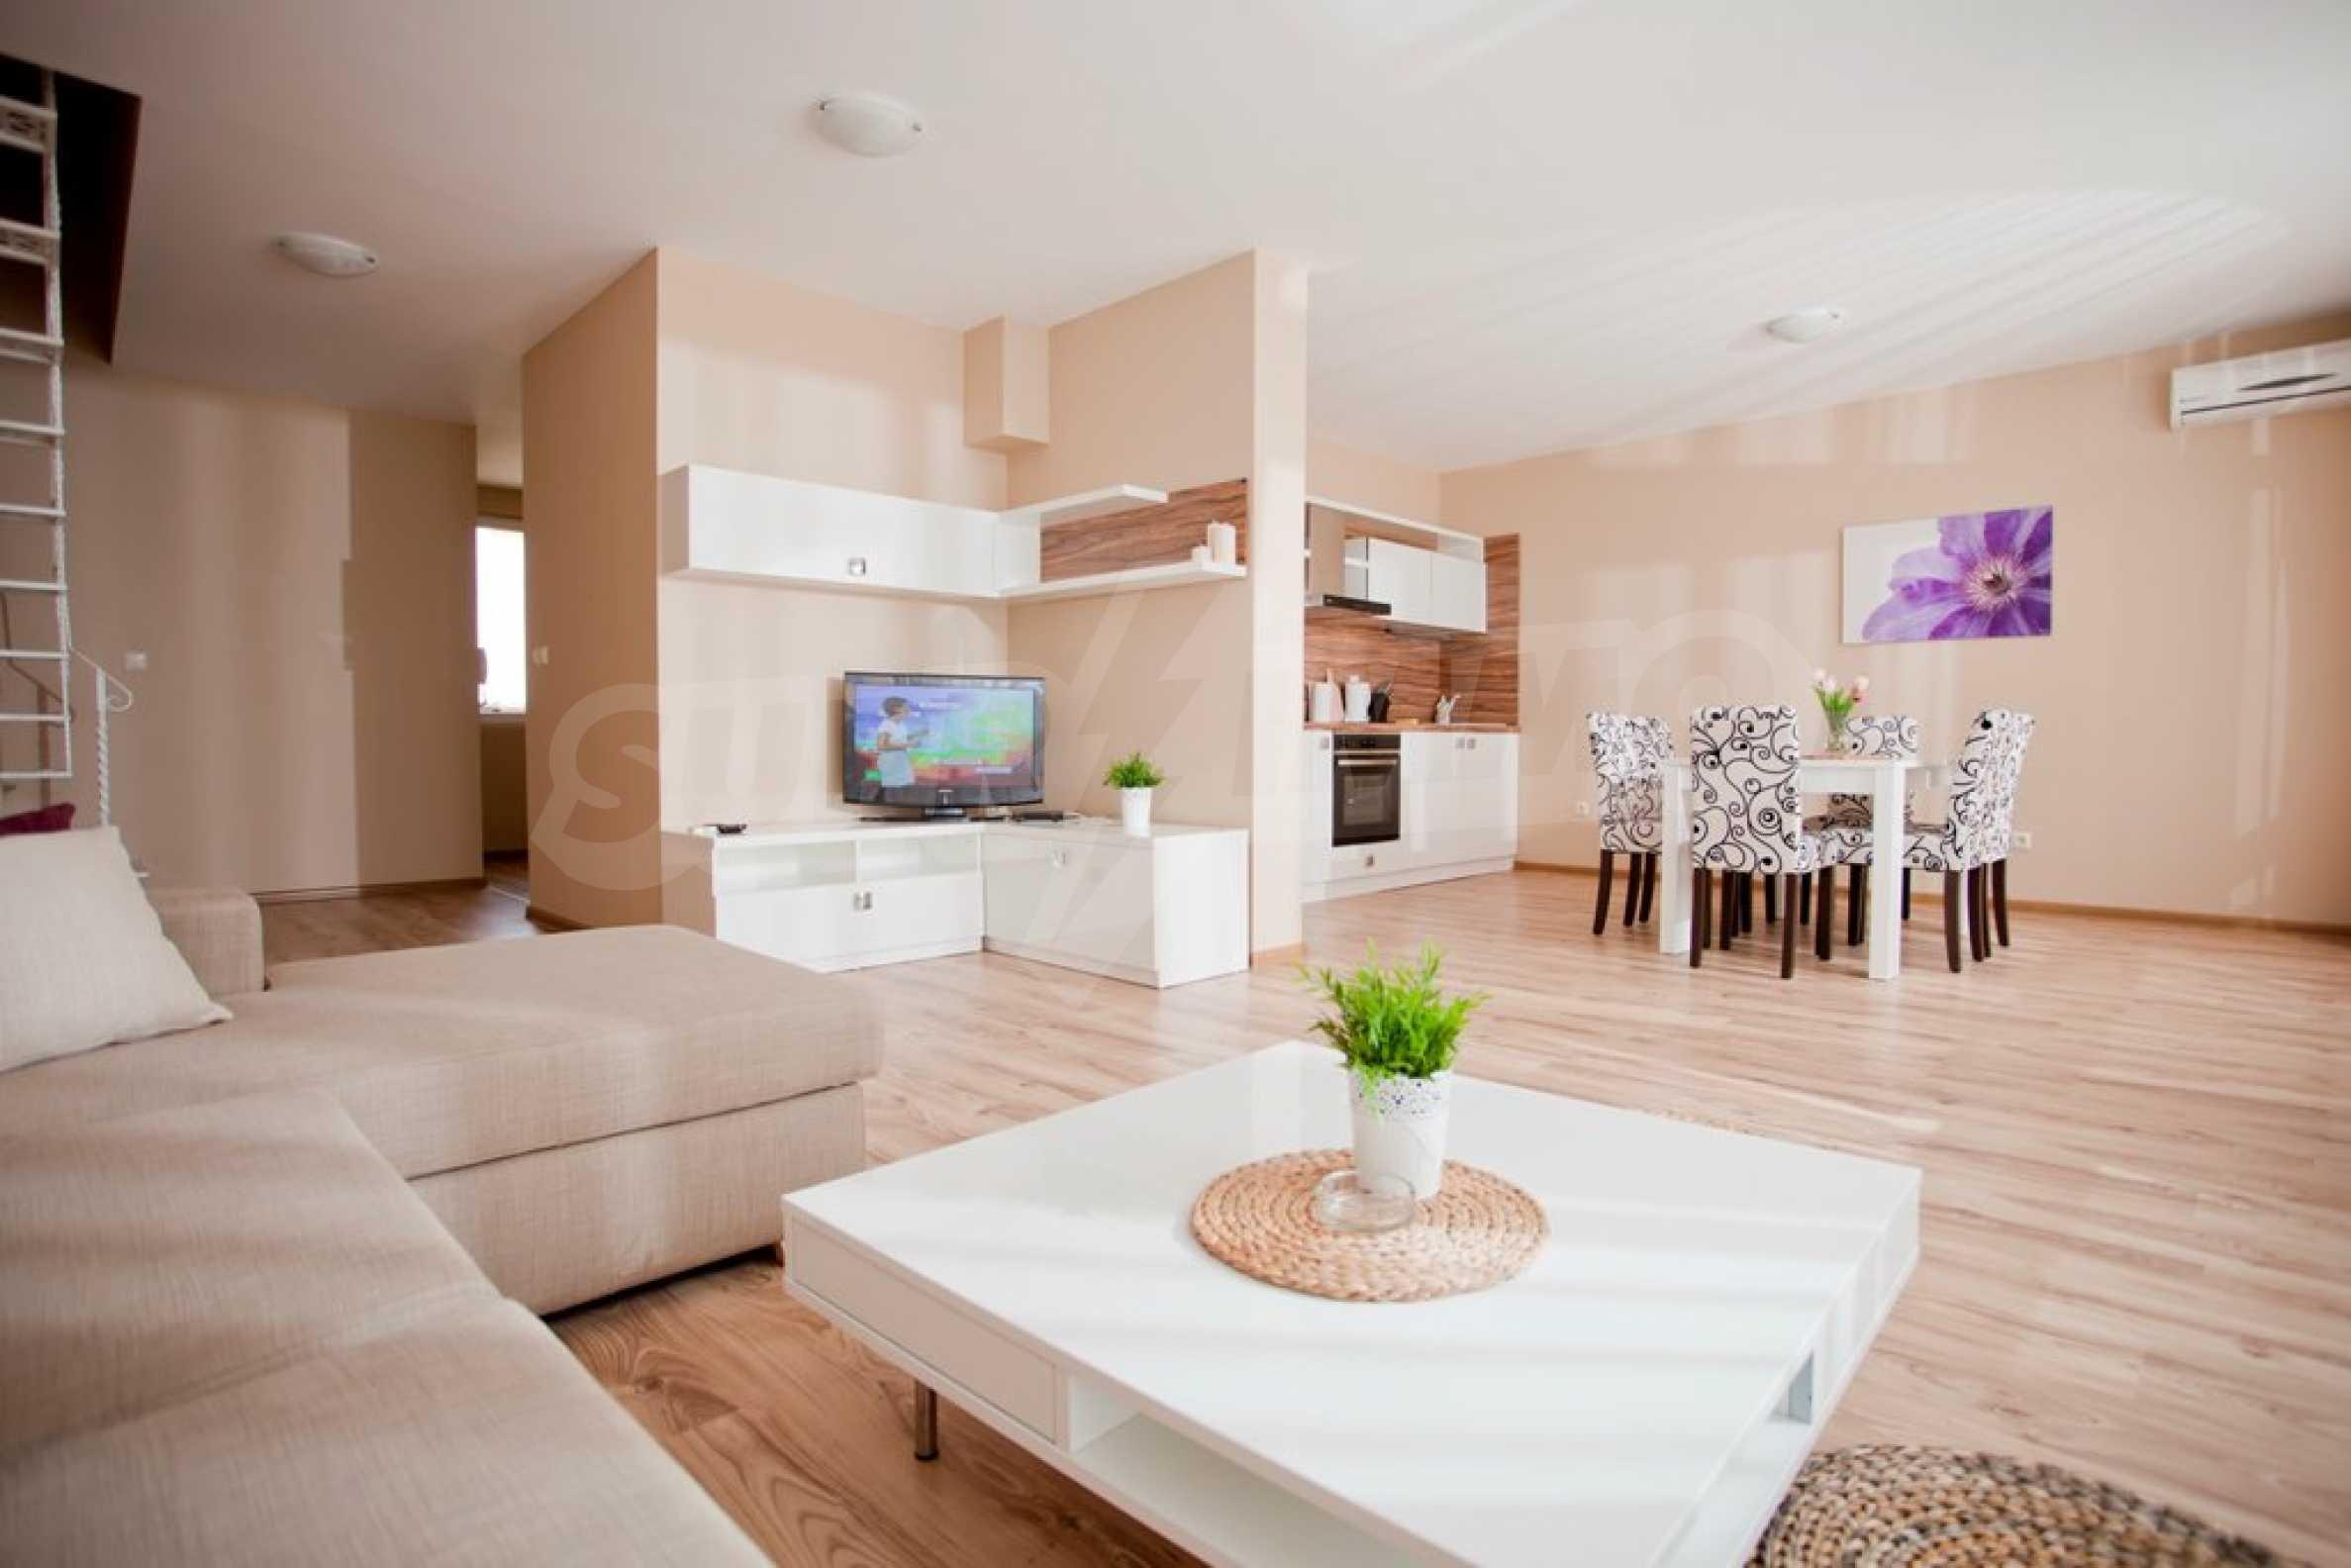 New apartment complex Atia resort in Chernomorets 18